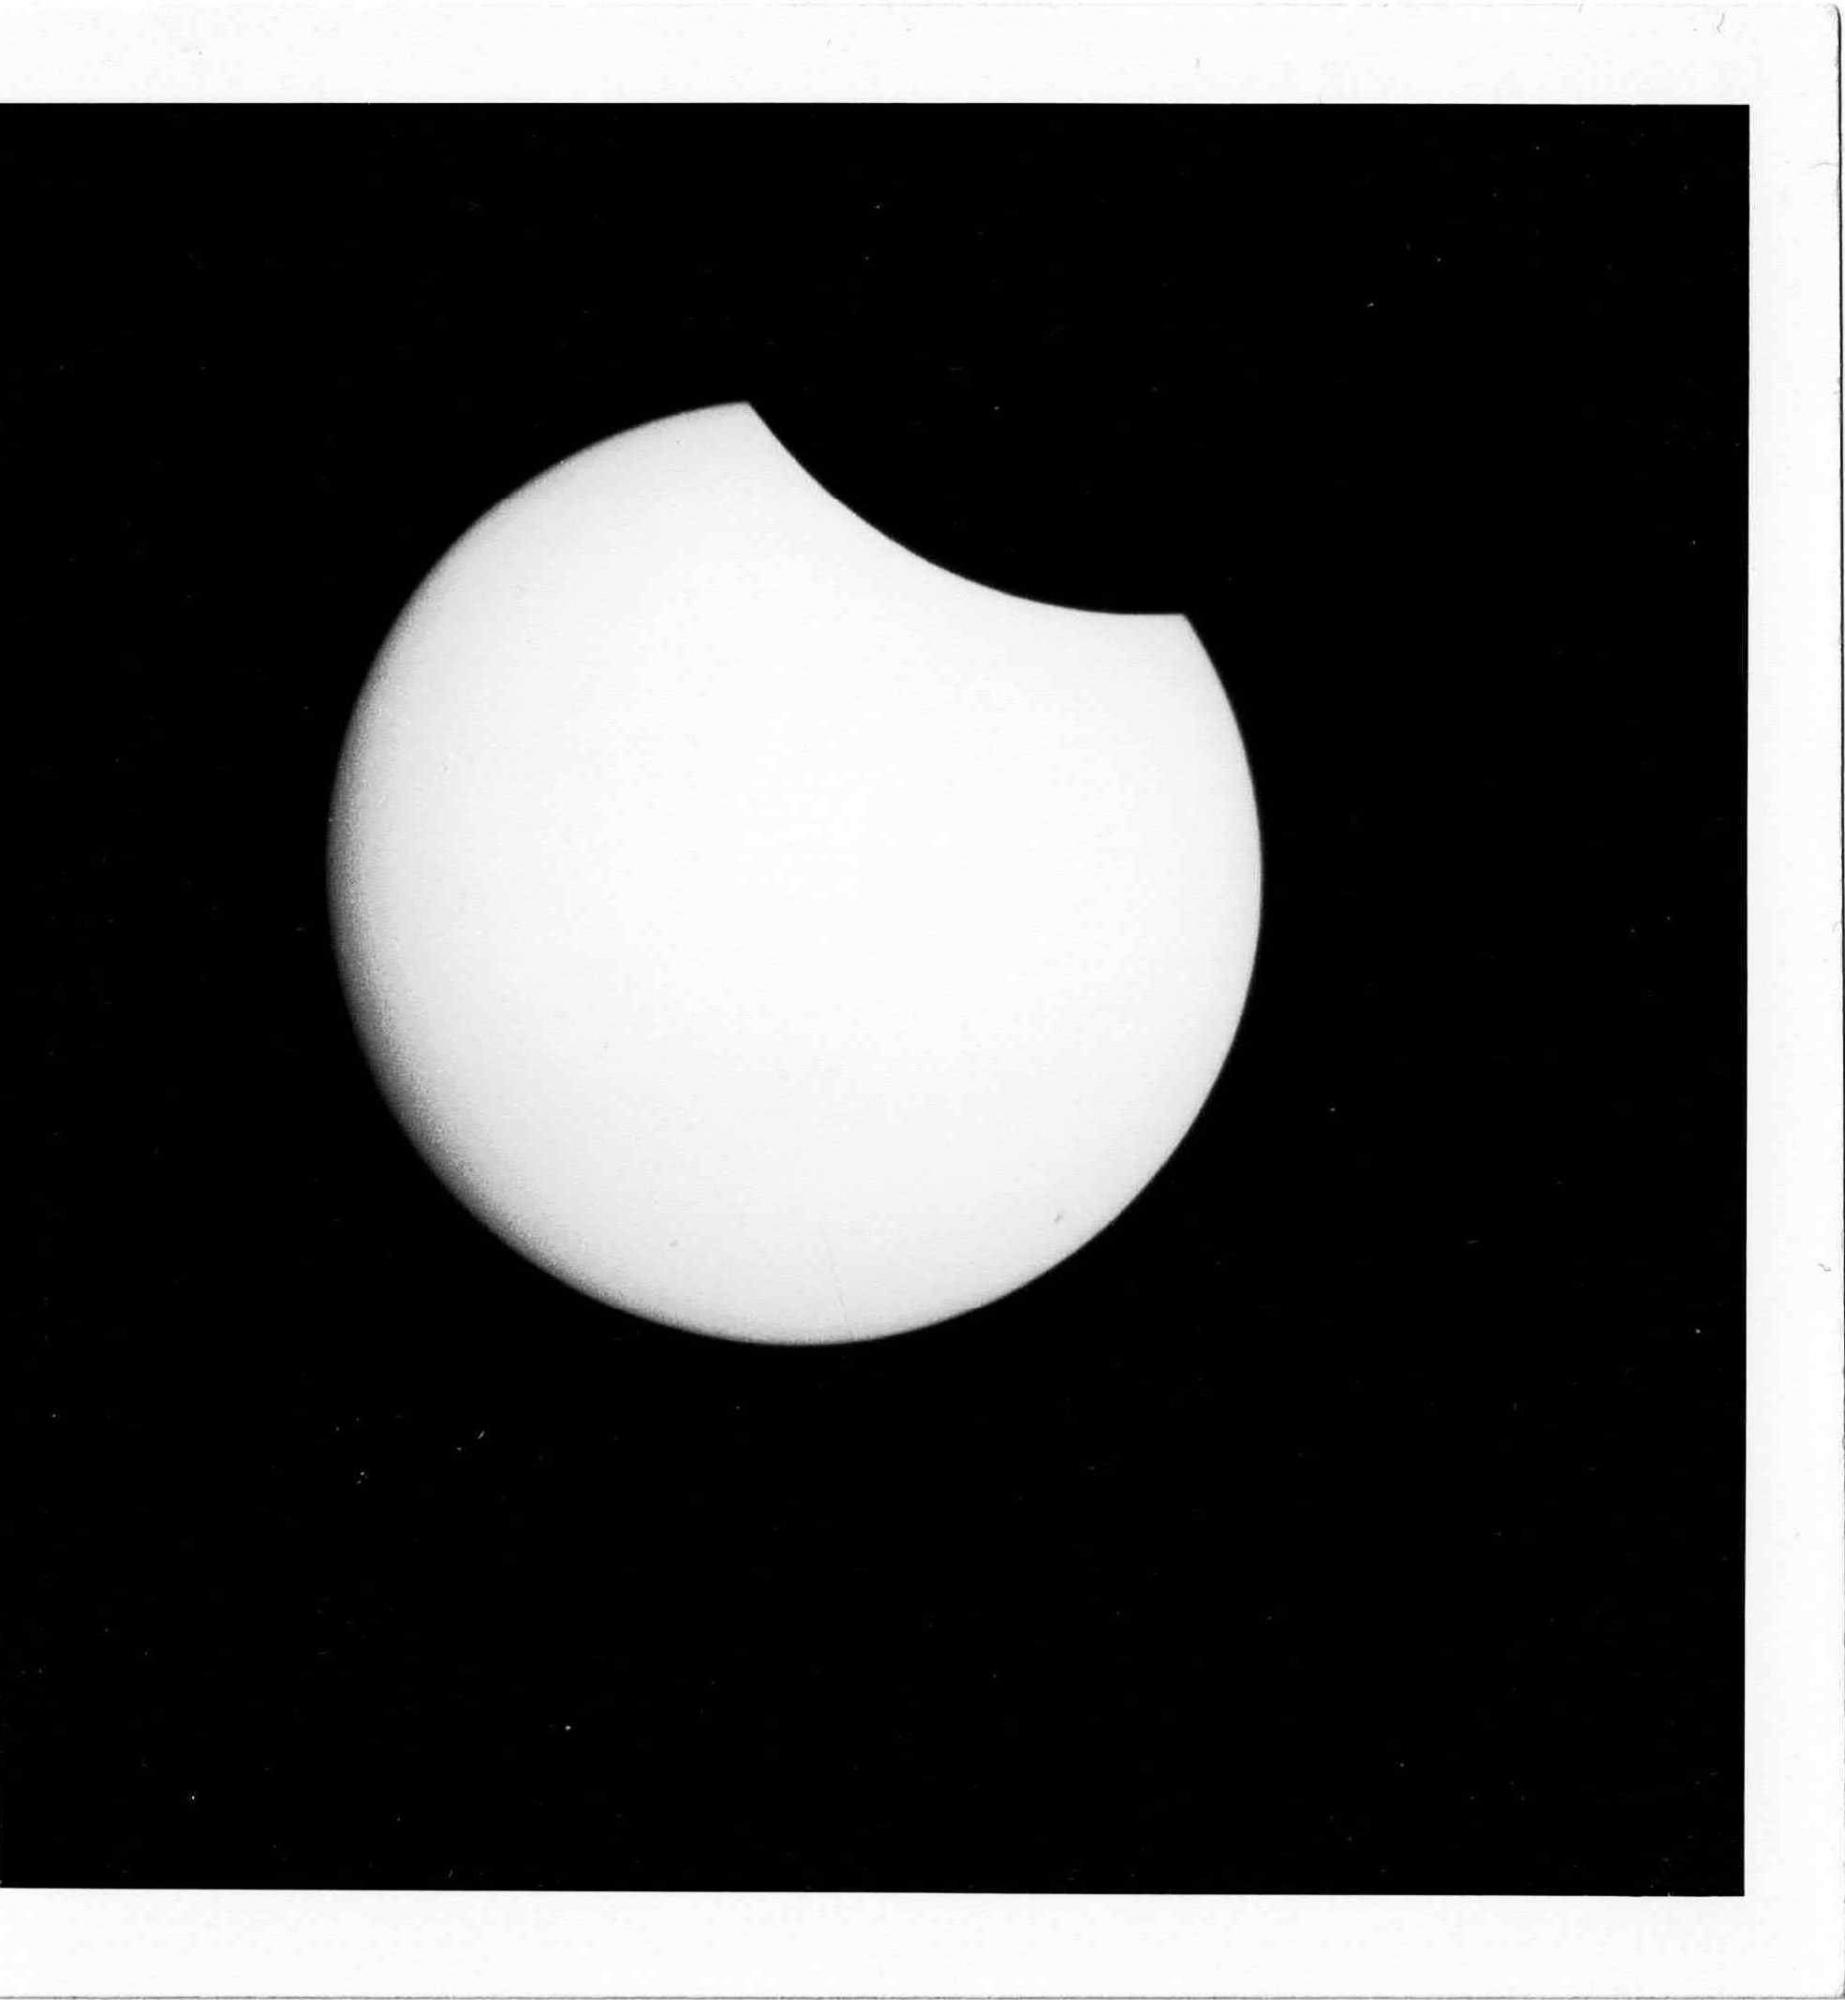 Eclipse_730630_StMarc_76-700-H20_Instamatic50_125ASA.thumb.jpg.29b0f4559f567dc0a88390808e79b621.jpg